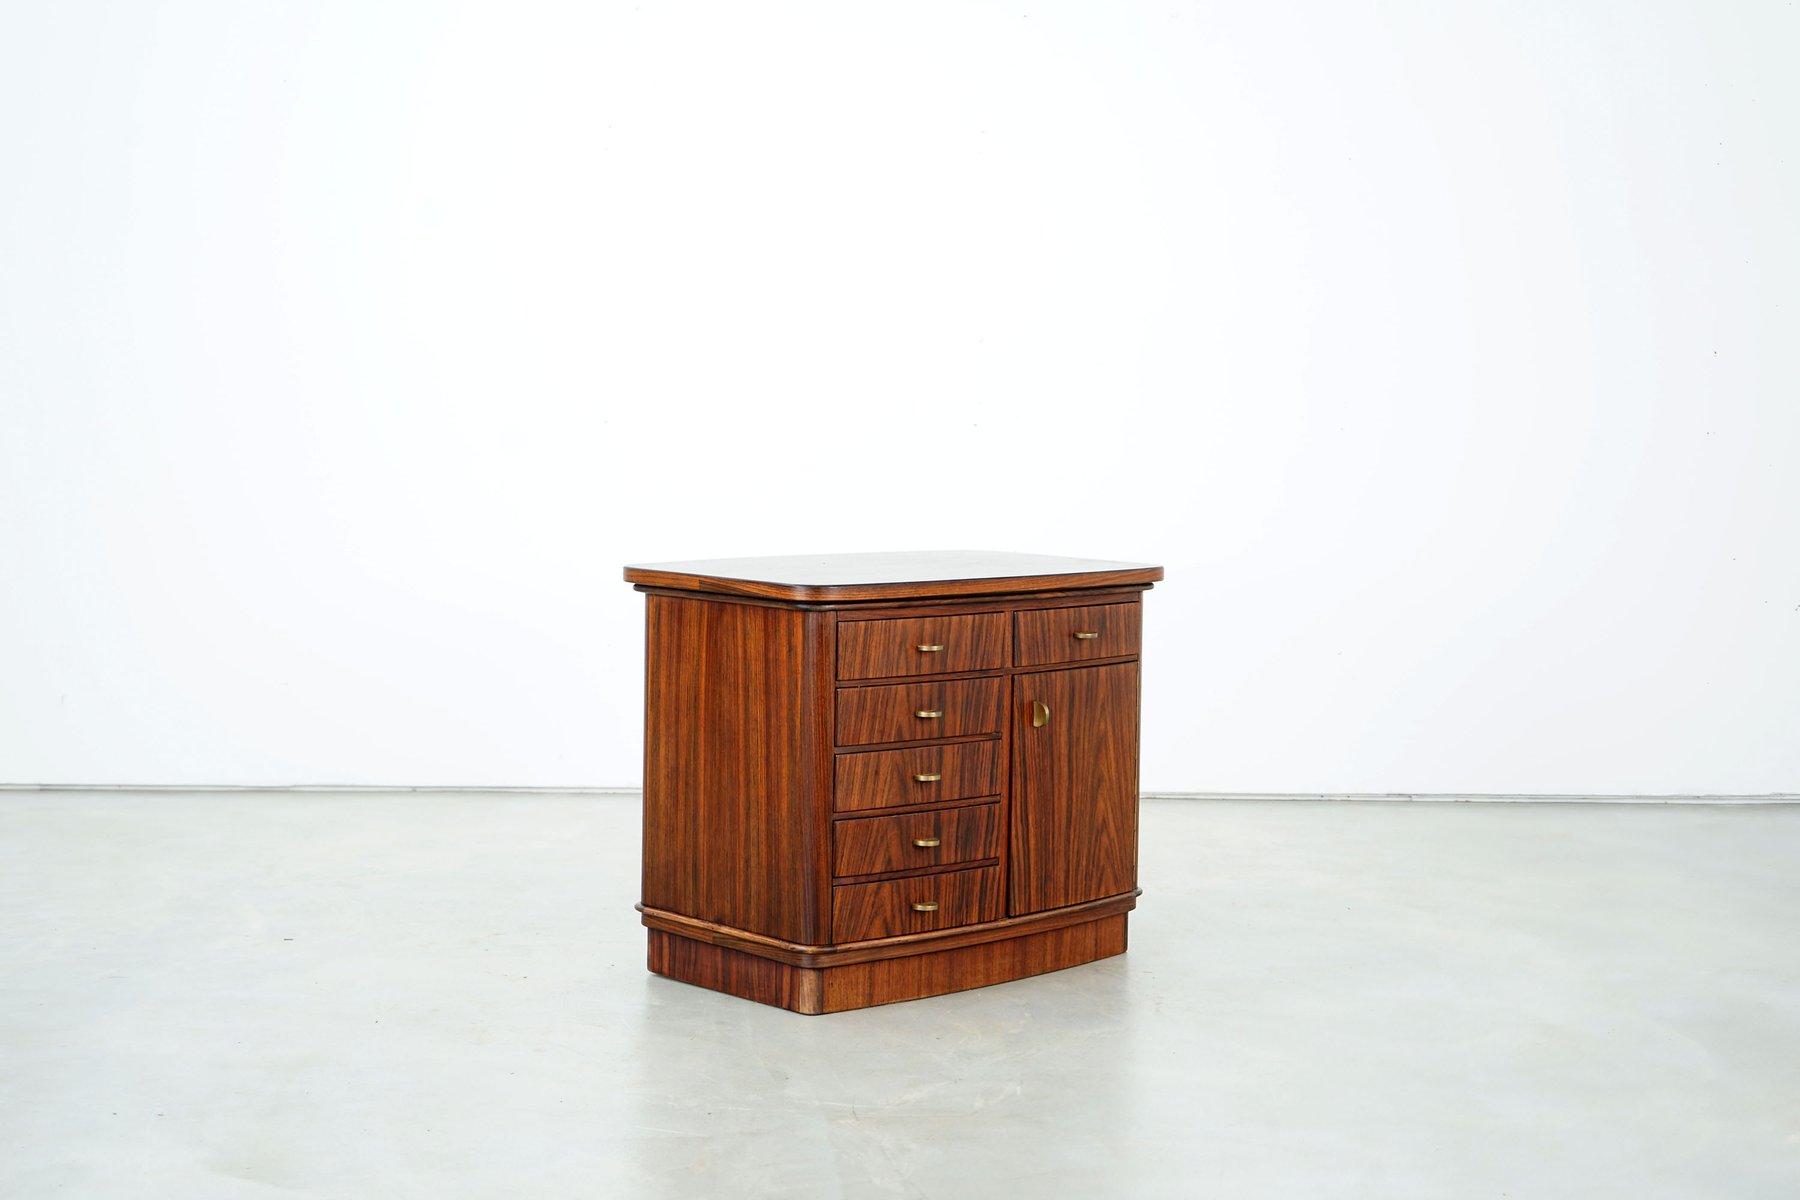 kommode mit messing griffen 1970er bei pamono kaufen. Black Bedroom Furniture Sets. Home Design Ideas